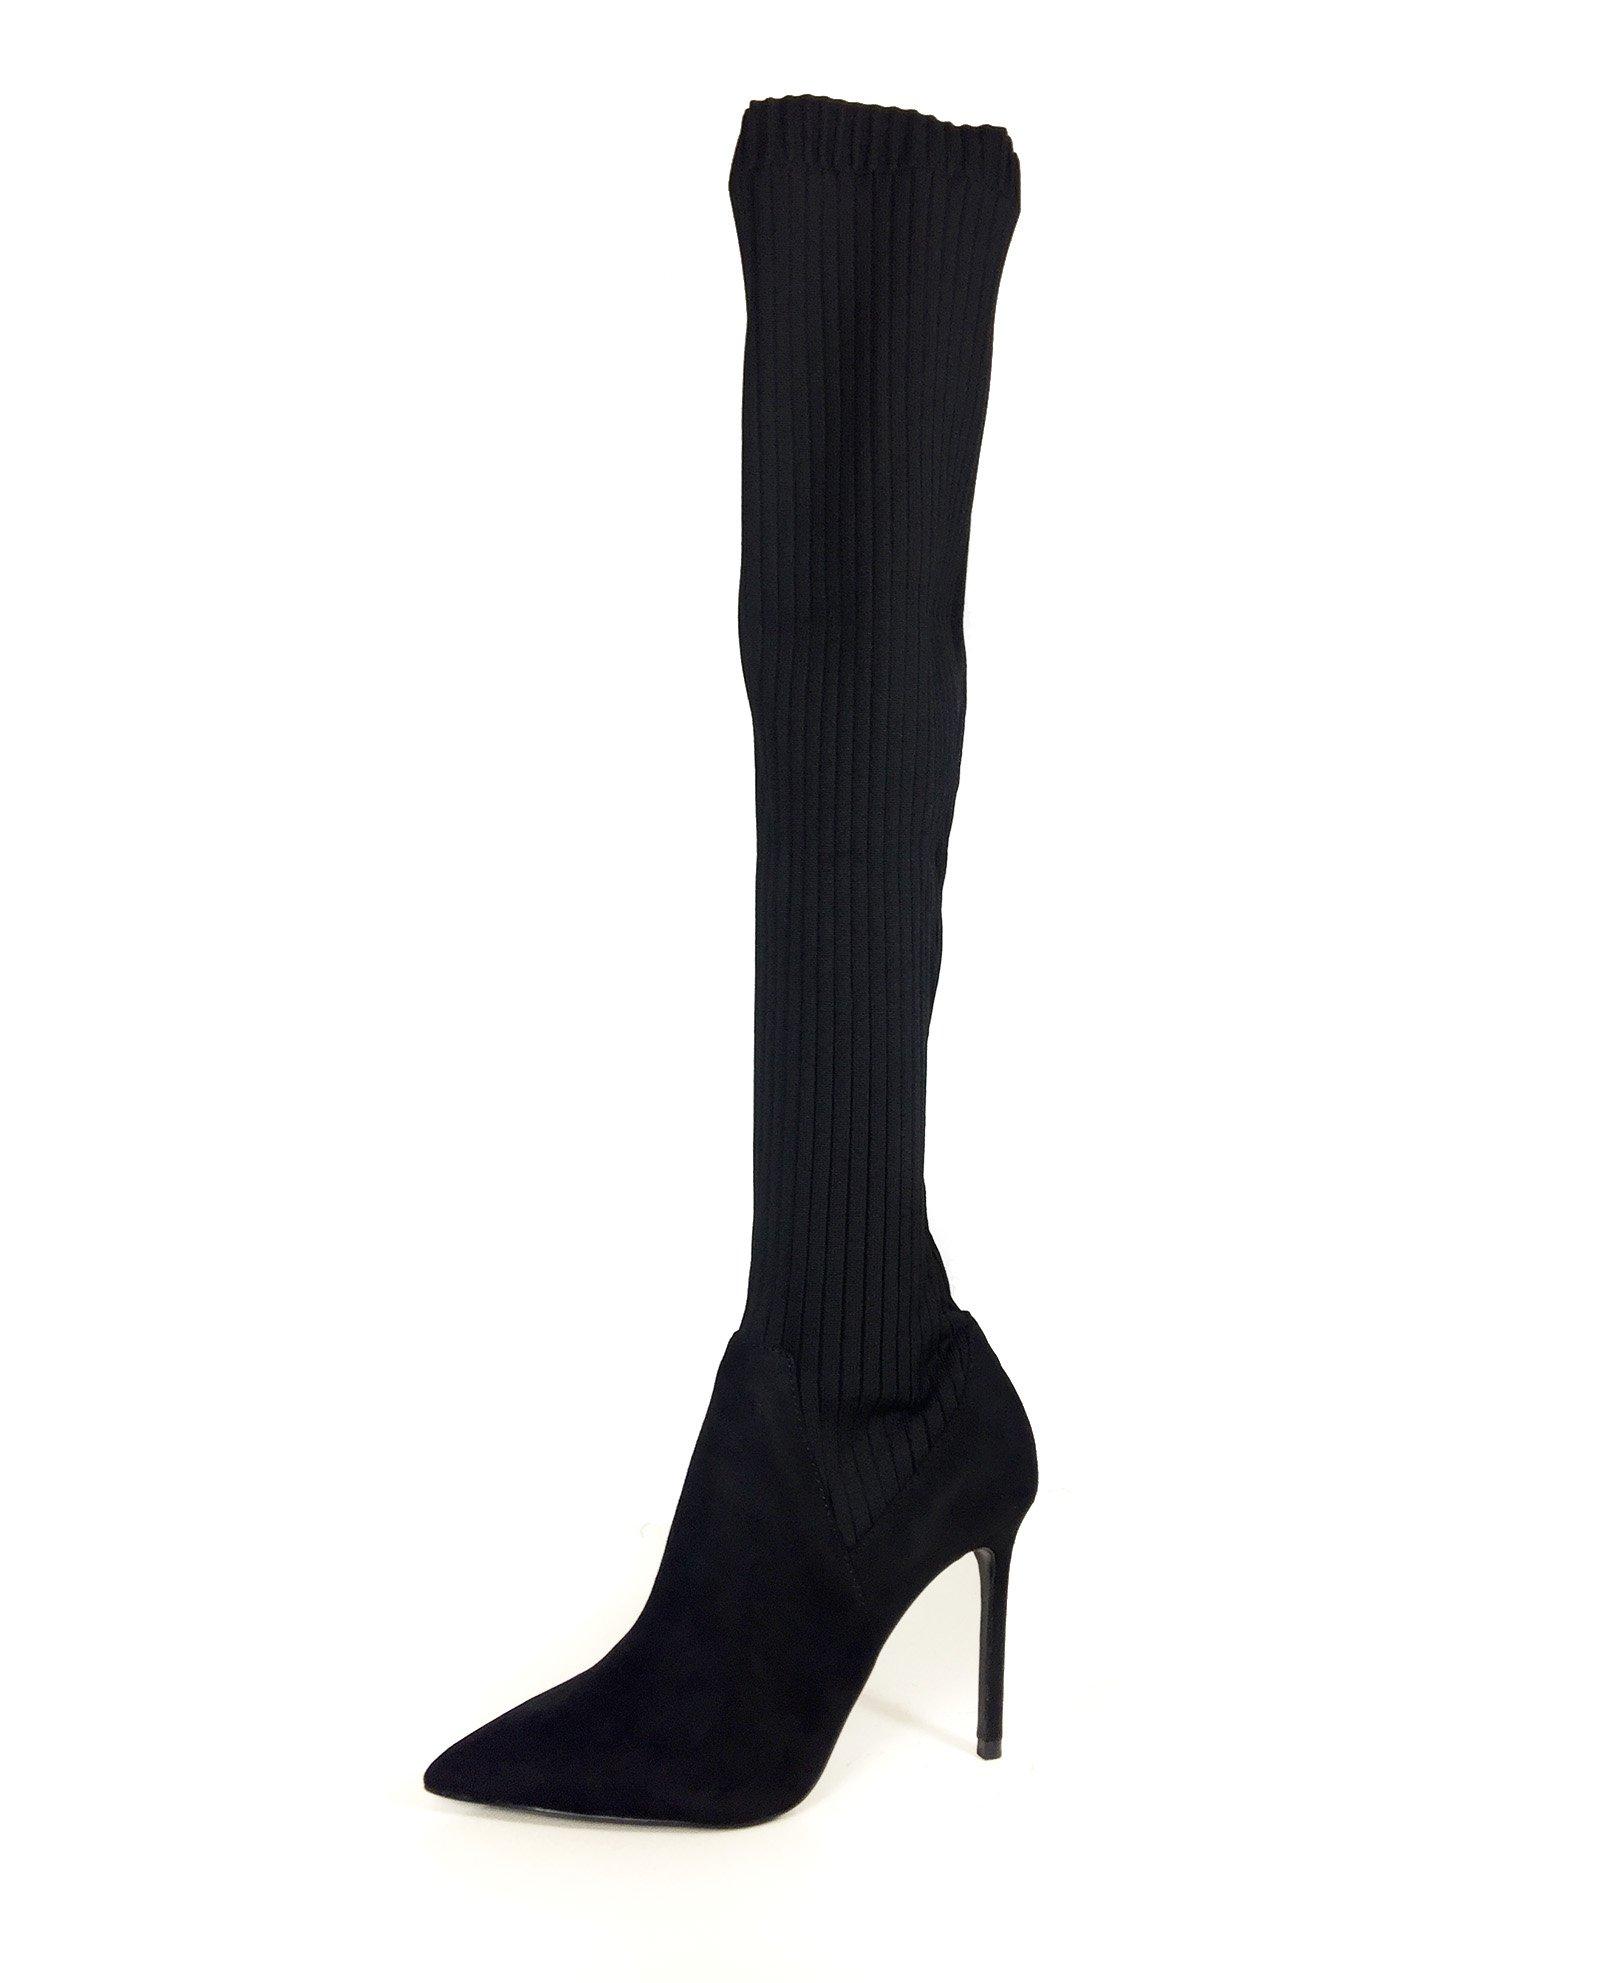 Zara Women Sock-style high heel boots 6018/201 (39 EU | 8 US | 6 UK) by Zara